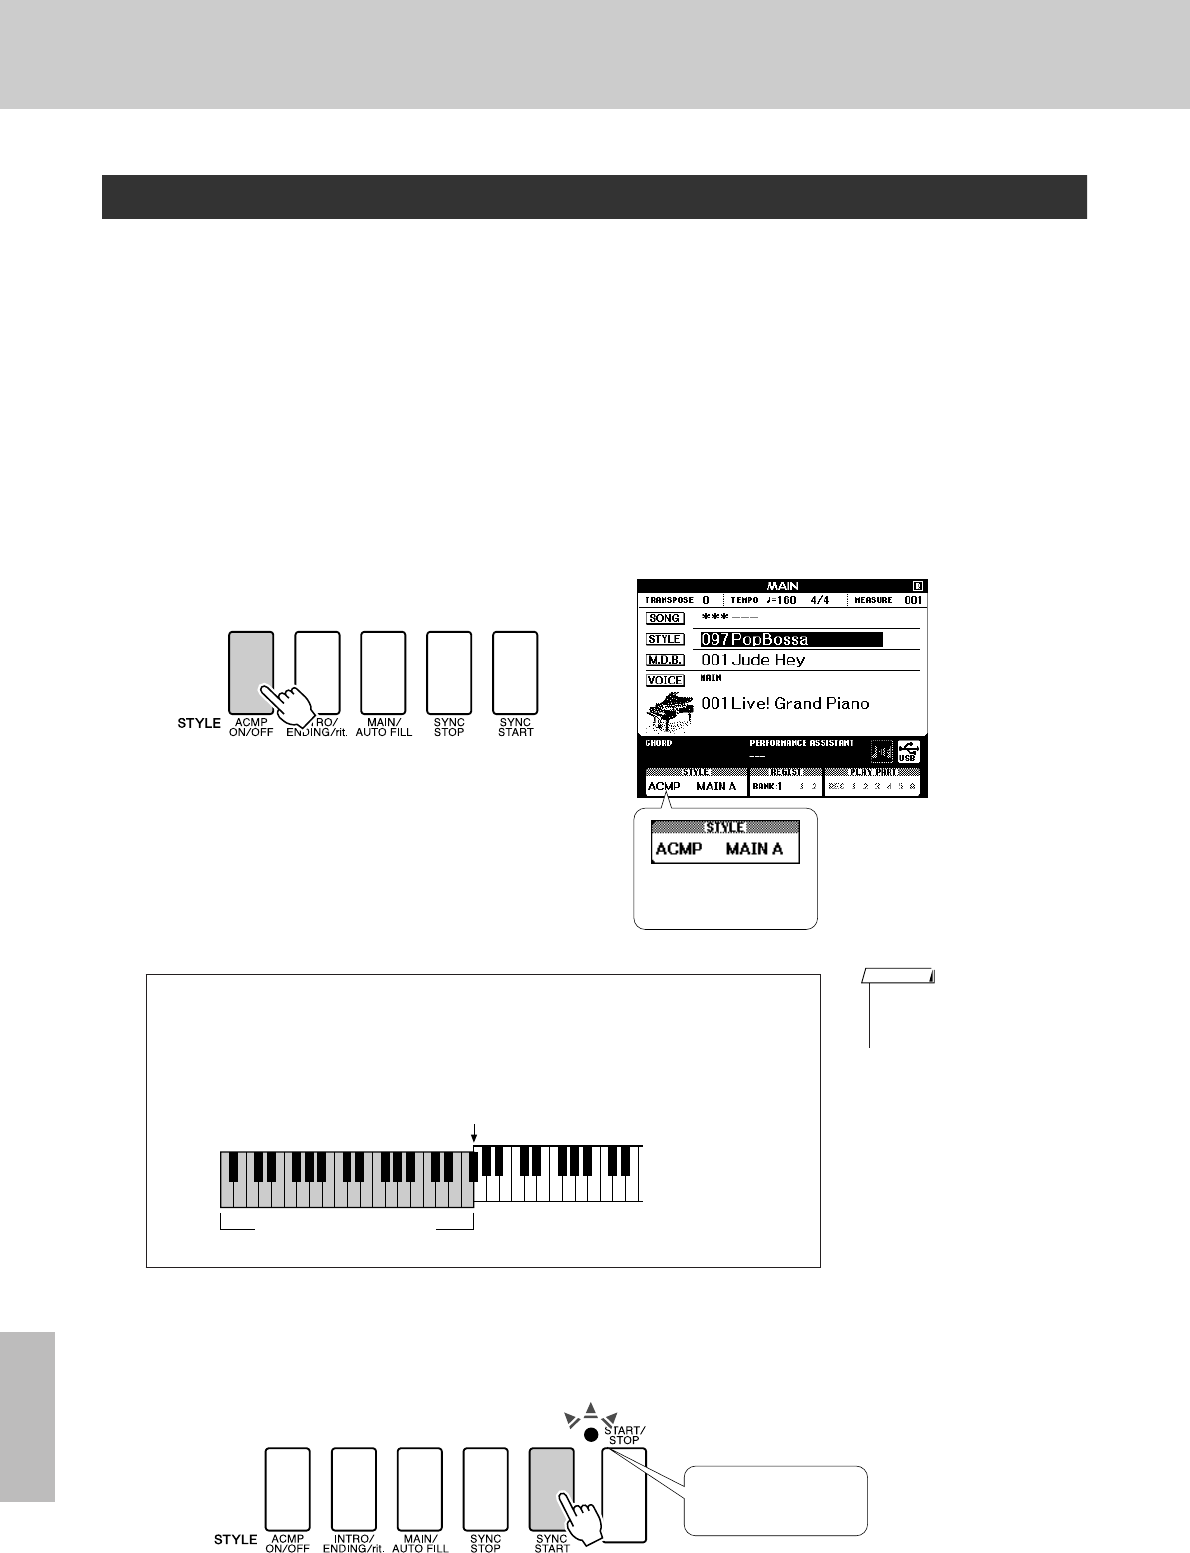 Yamaha DGX 530 YPG 535 Owner's Manual Dgx530 Es Om A0